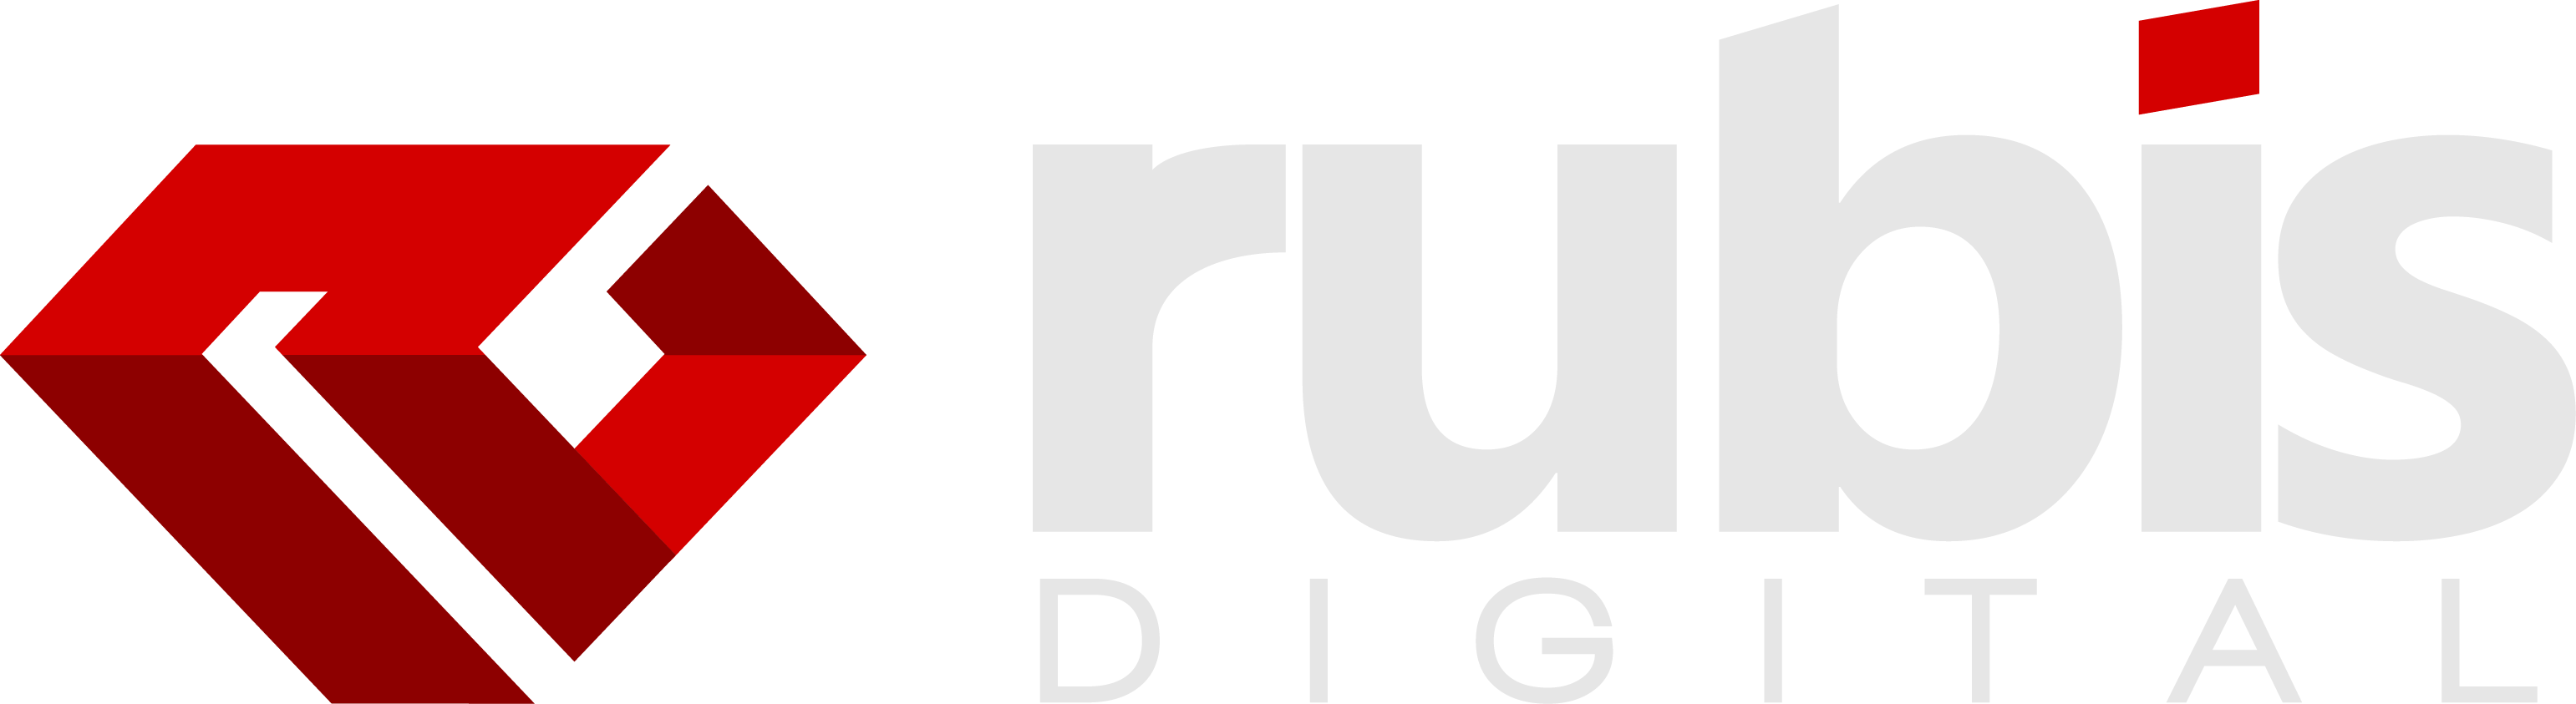 innovative kiwi start-up needs its new digital gem logo